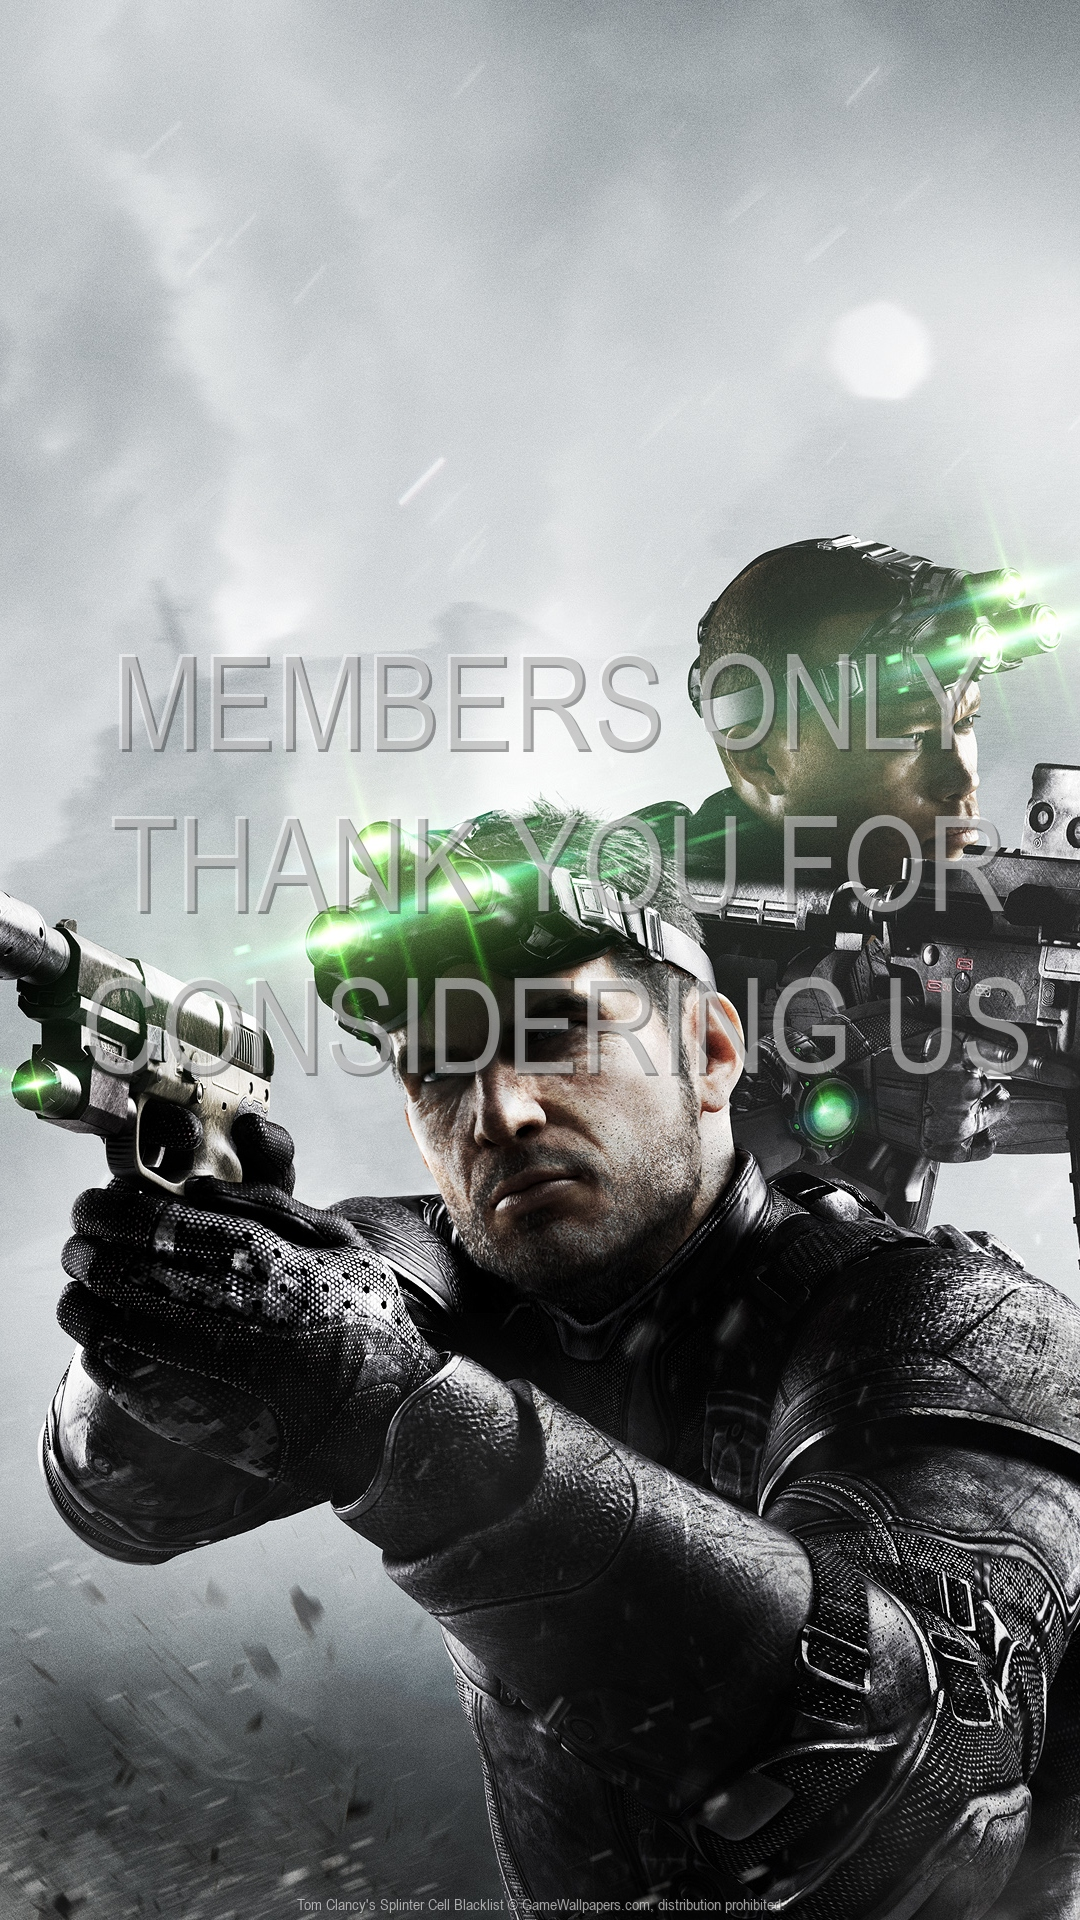 Tom Clancys Splinter Cell Blacklist 1920x1080 Mobile Wallpaper Or Background 06